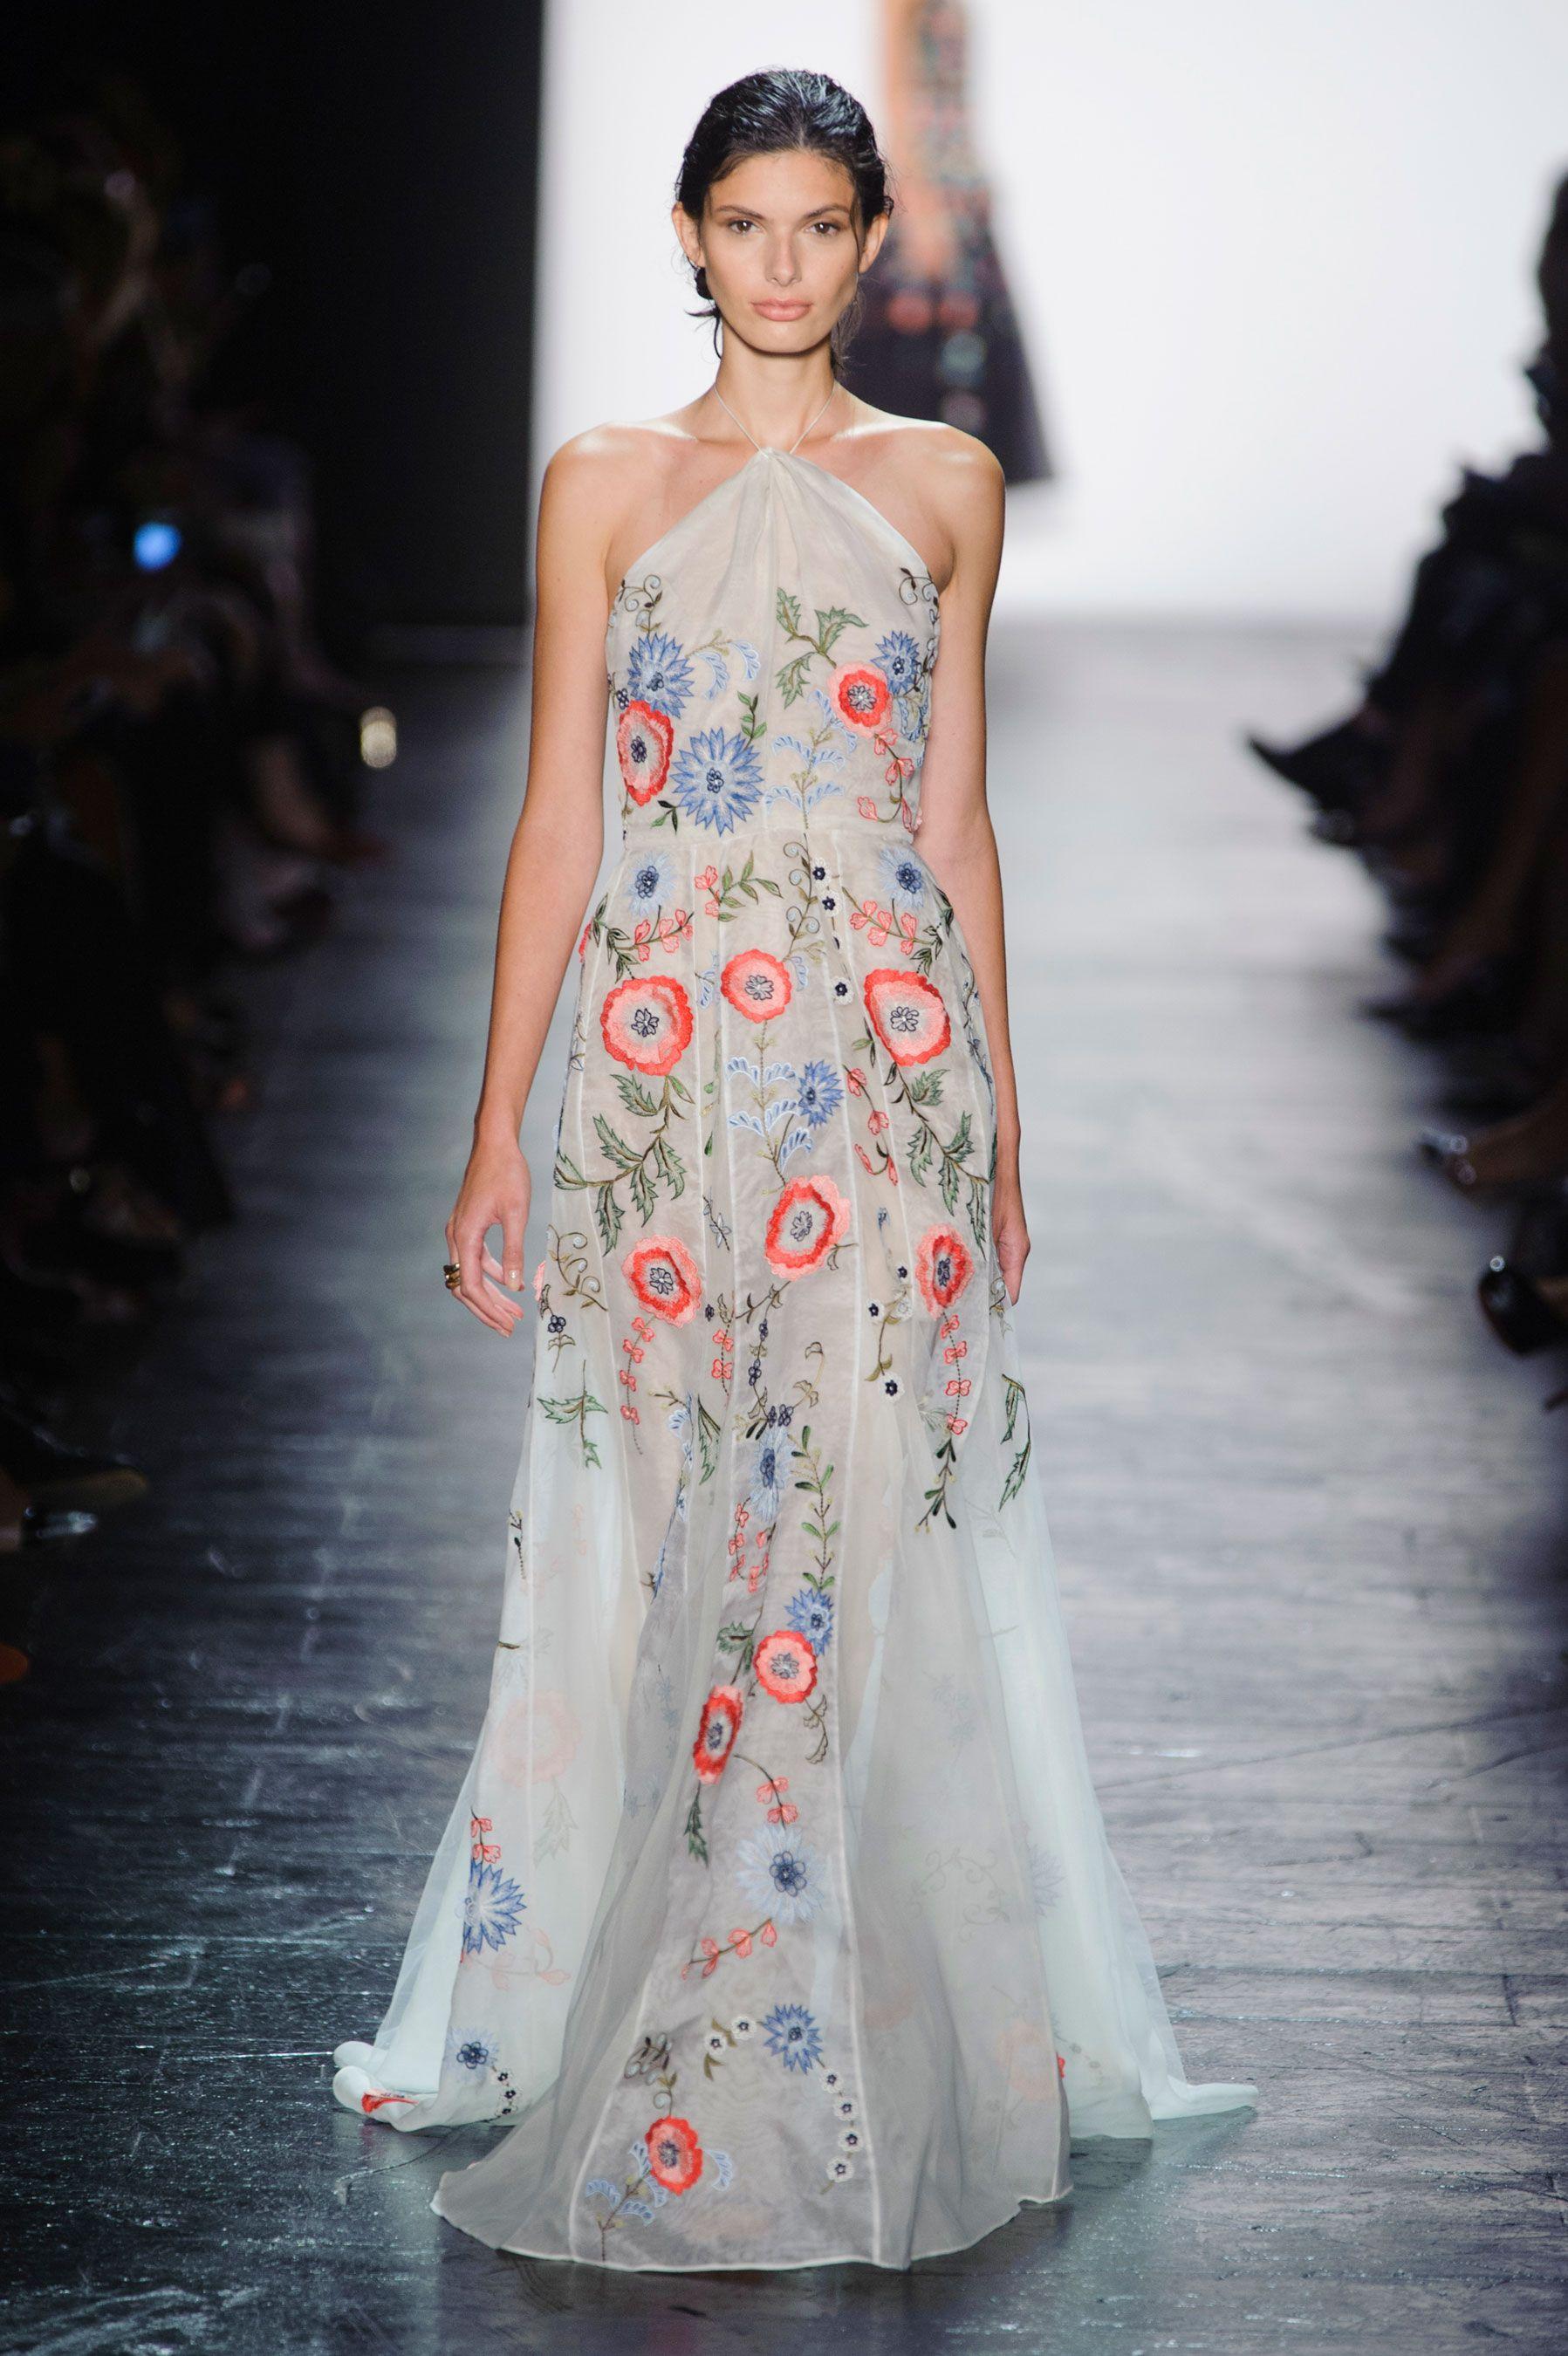 Fashion show evening dress